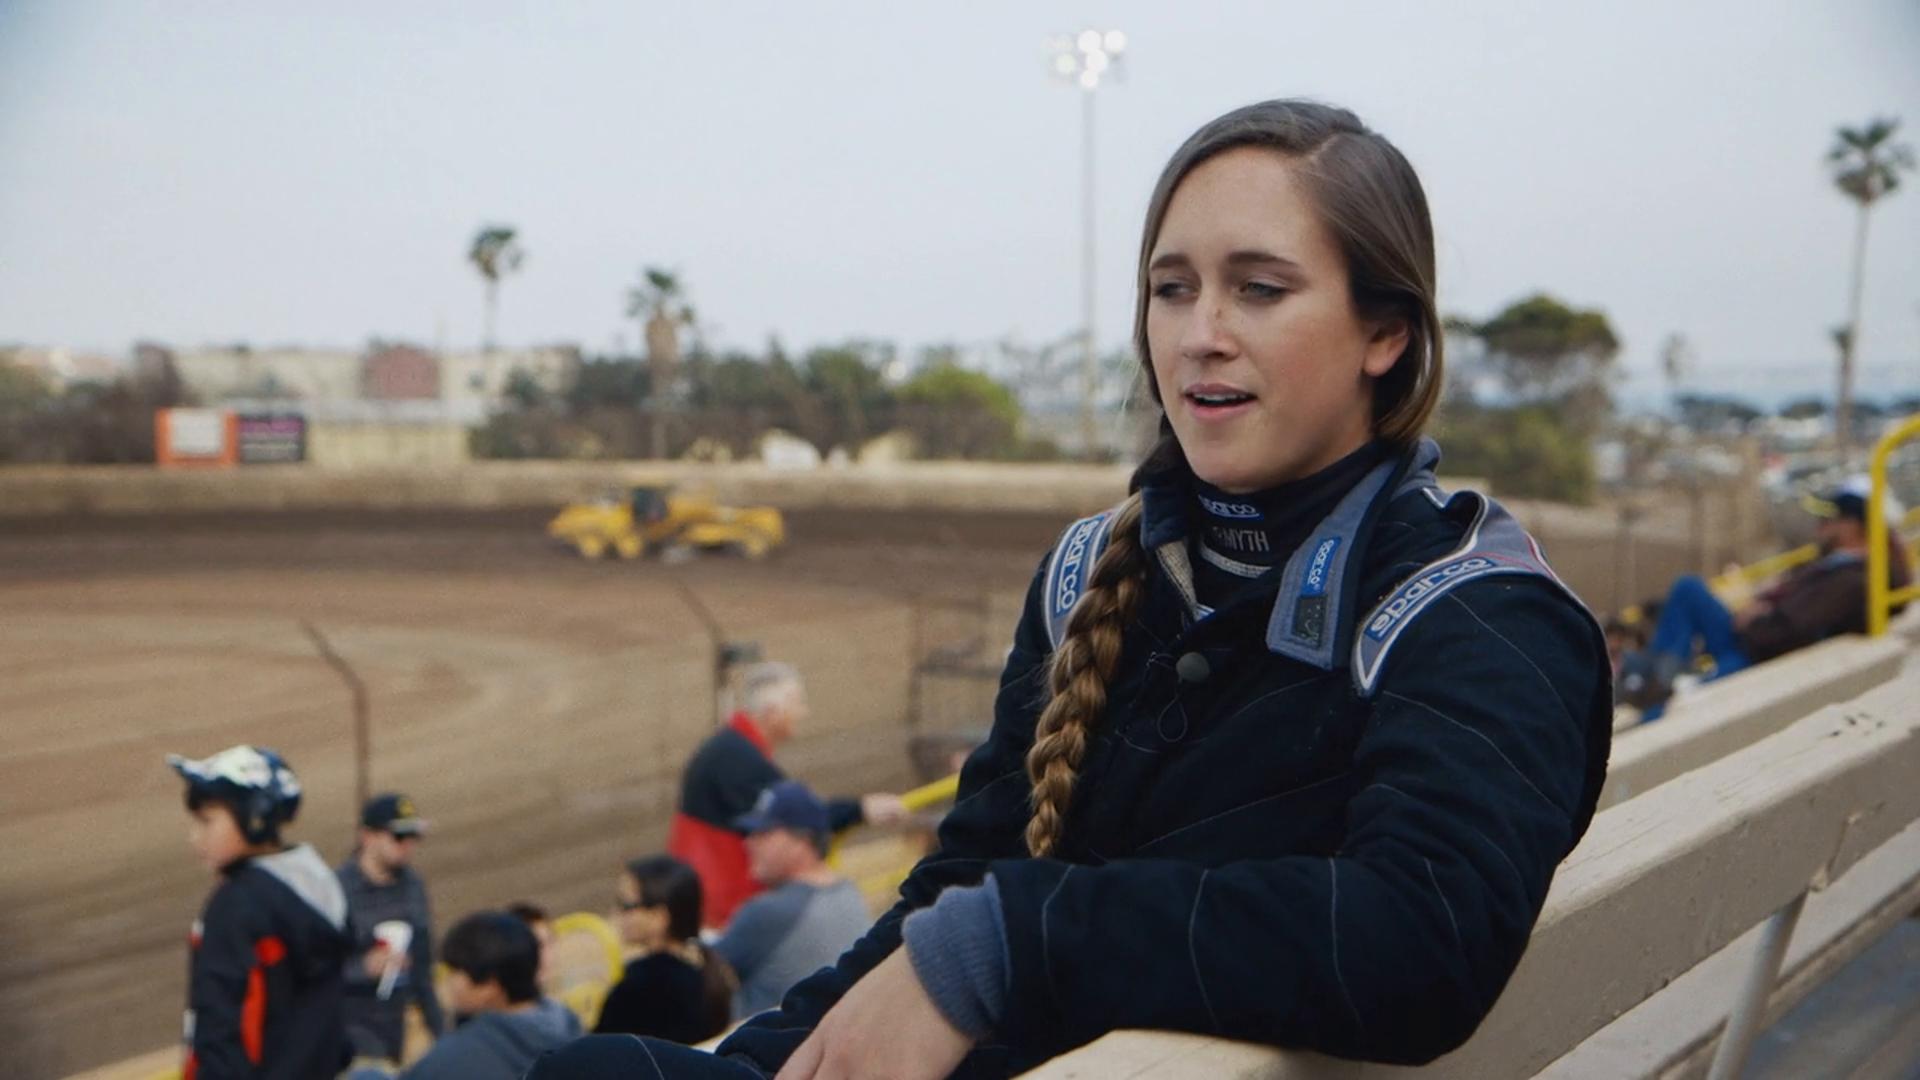 Thumbnail for Jessica Clark Racing